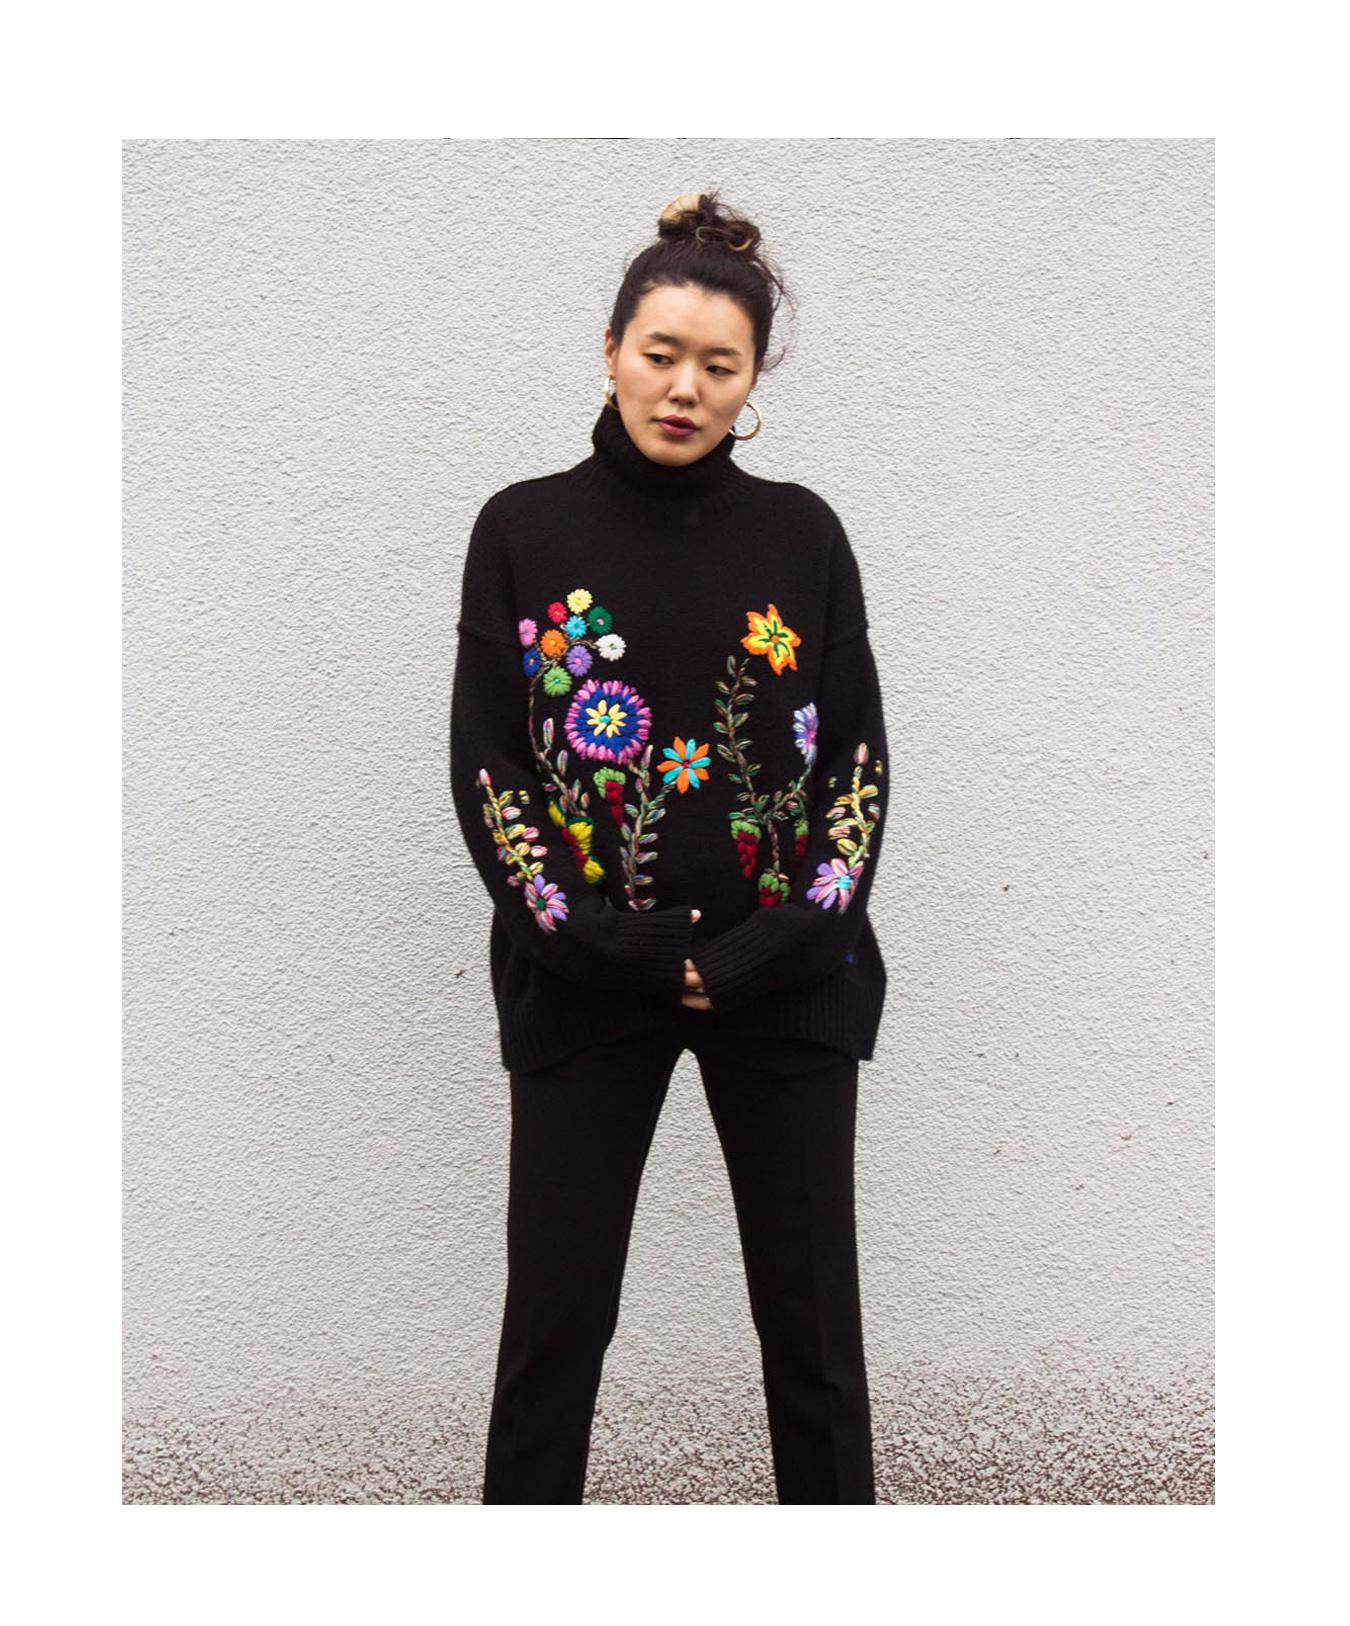 Mandkhai wearing flower embroidered oversized2 jumper